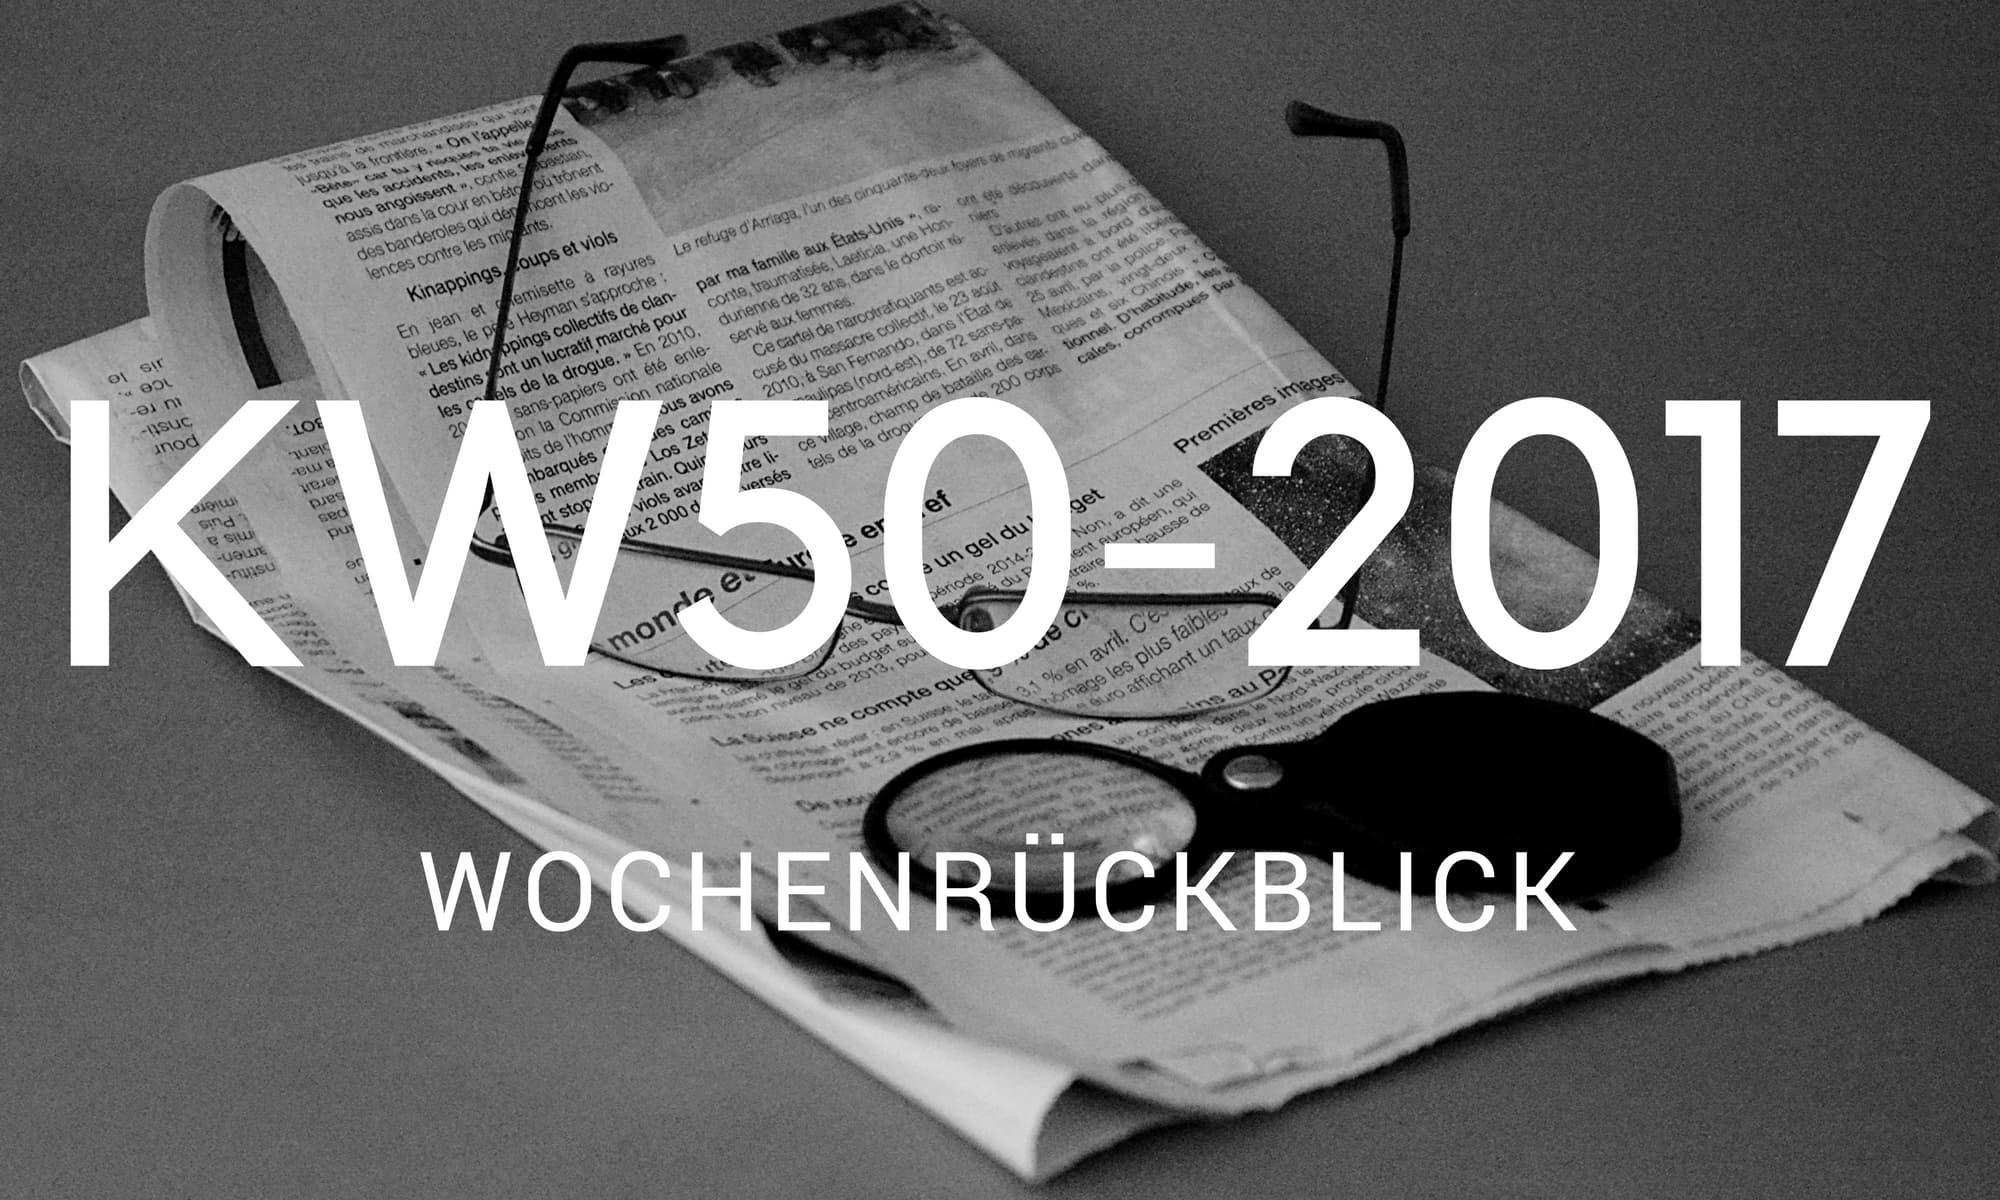 wochenrueckblick camping news KW50-2017